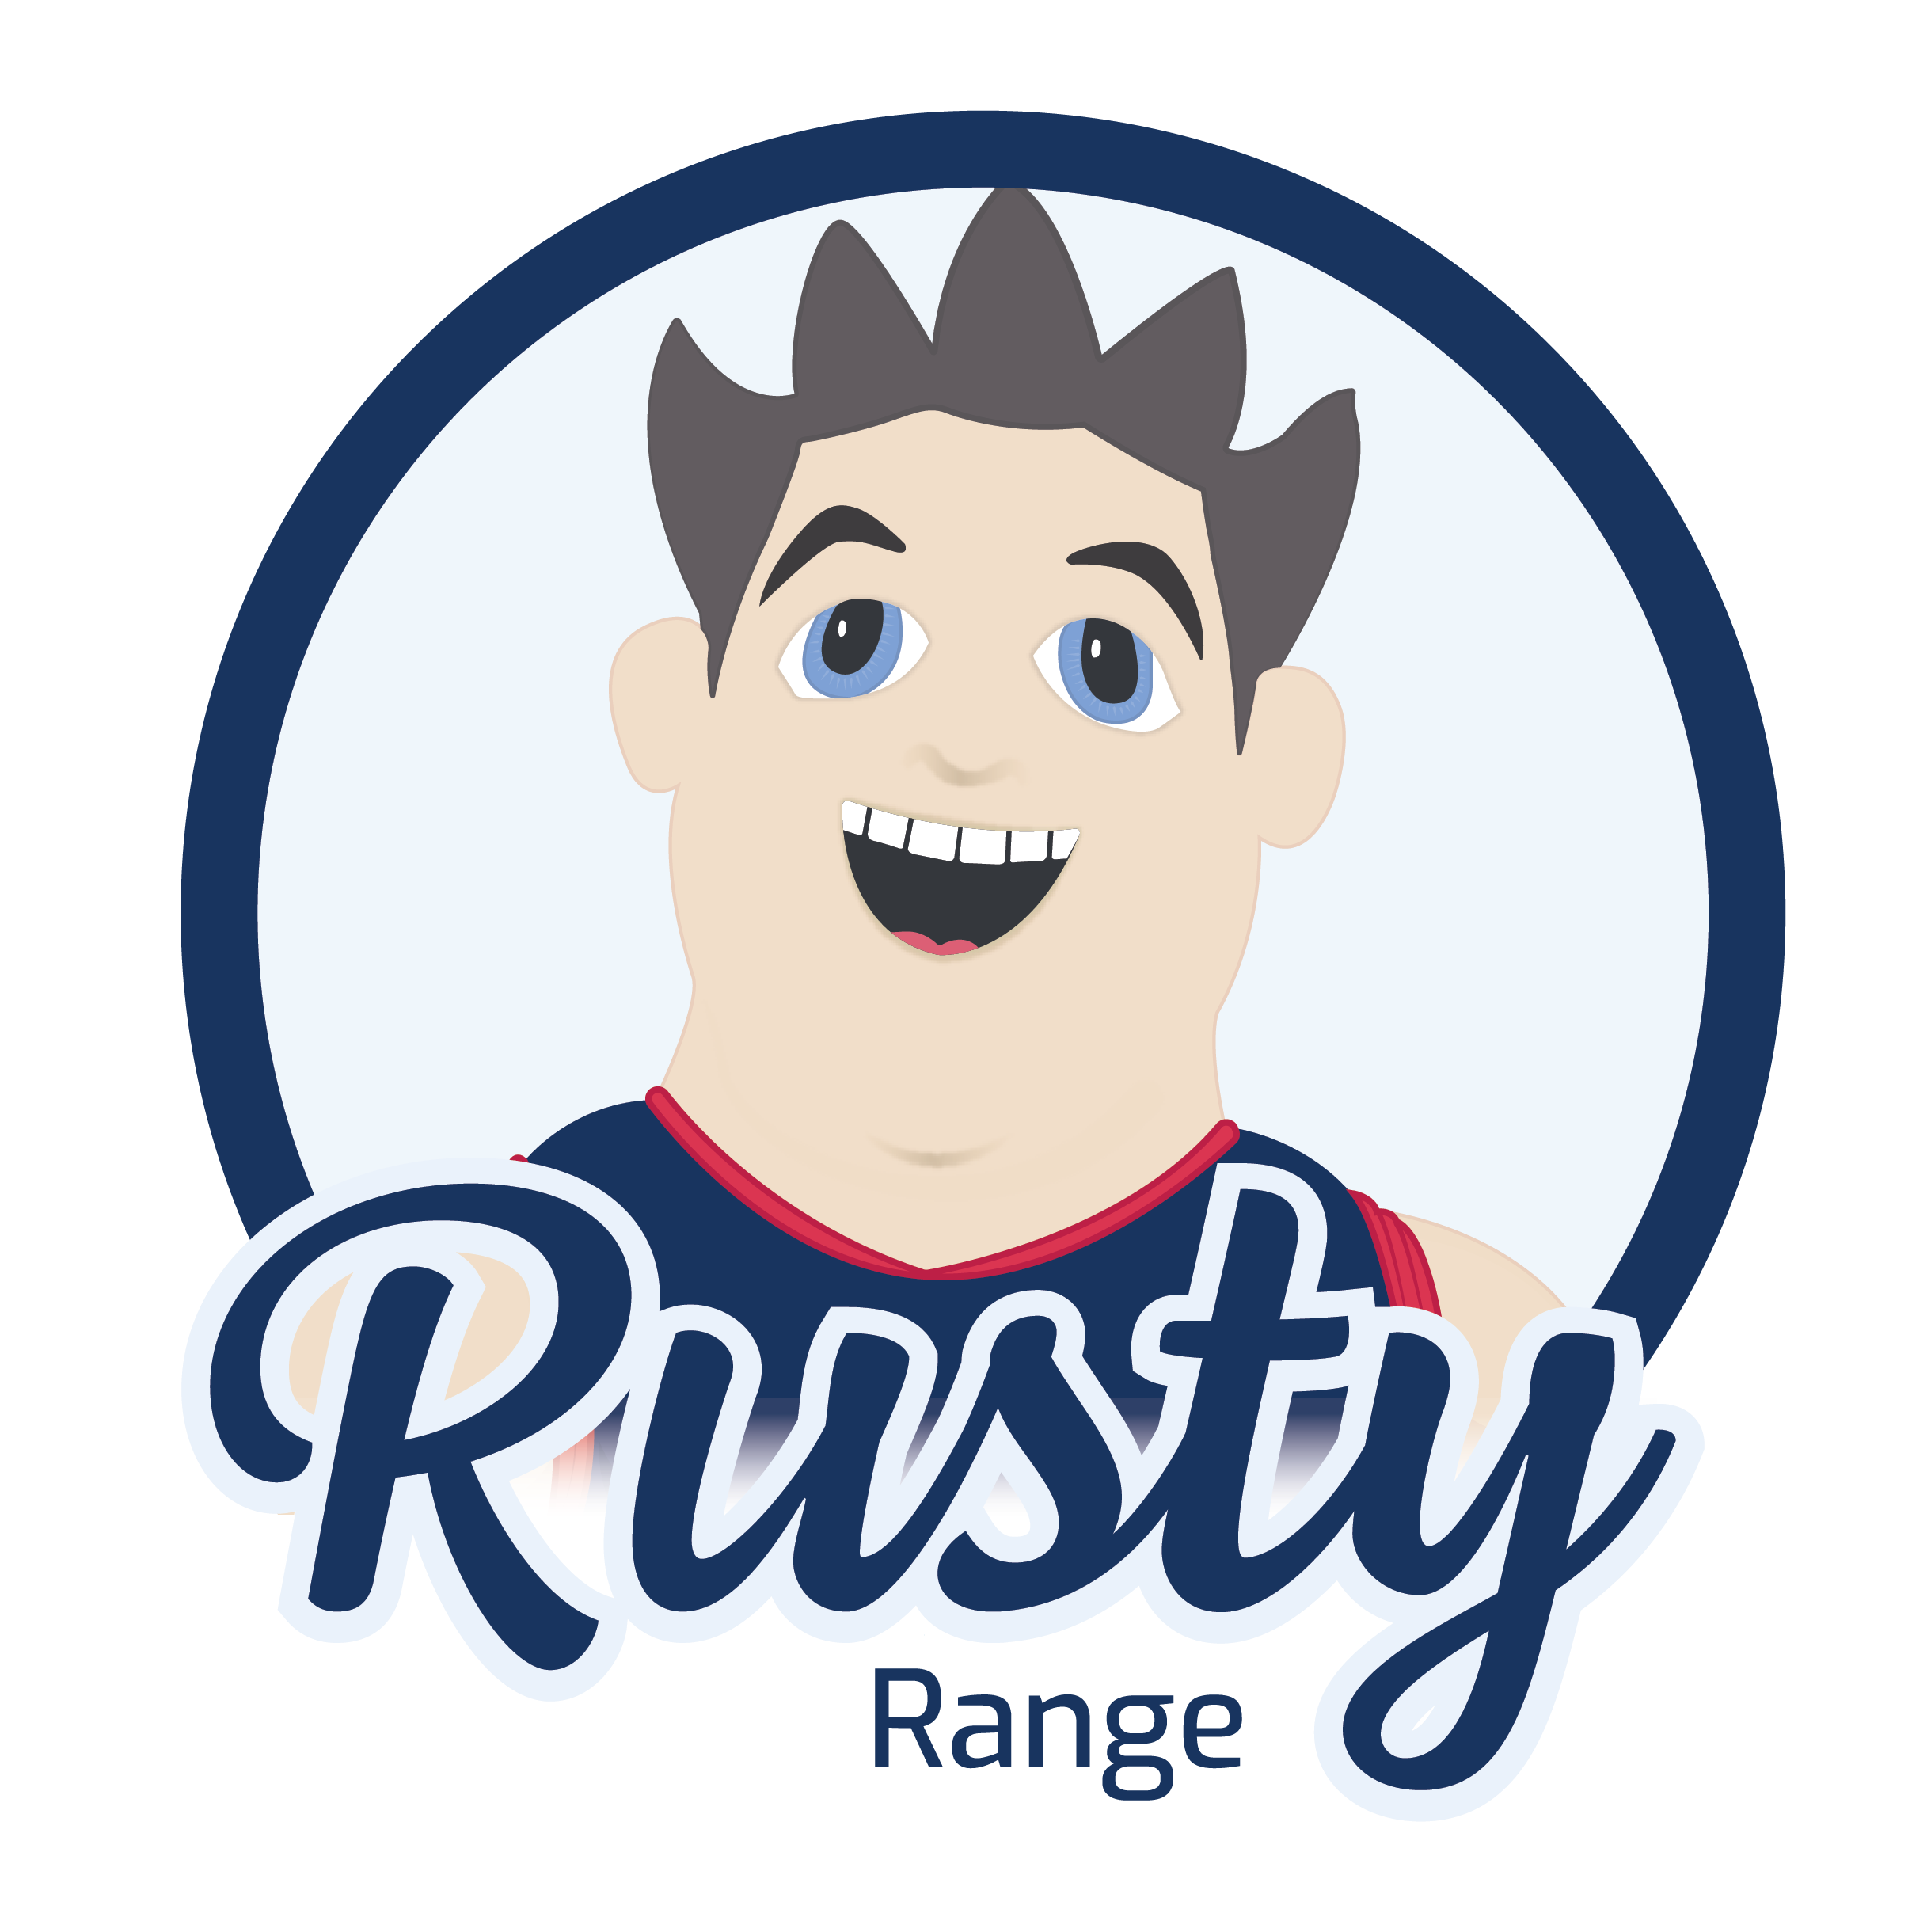 RUSTY RANGE